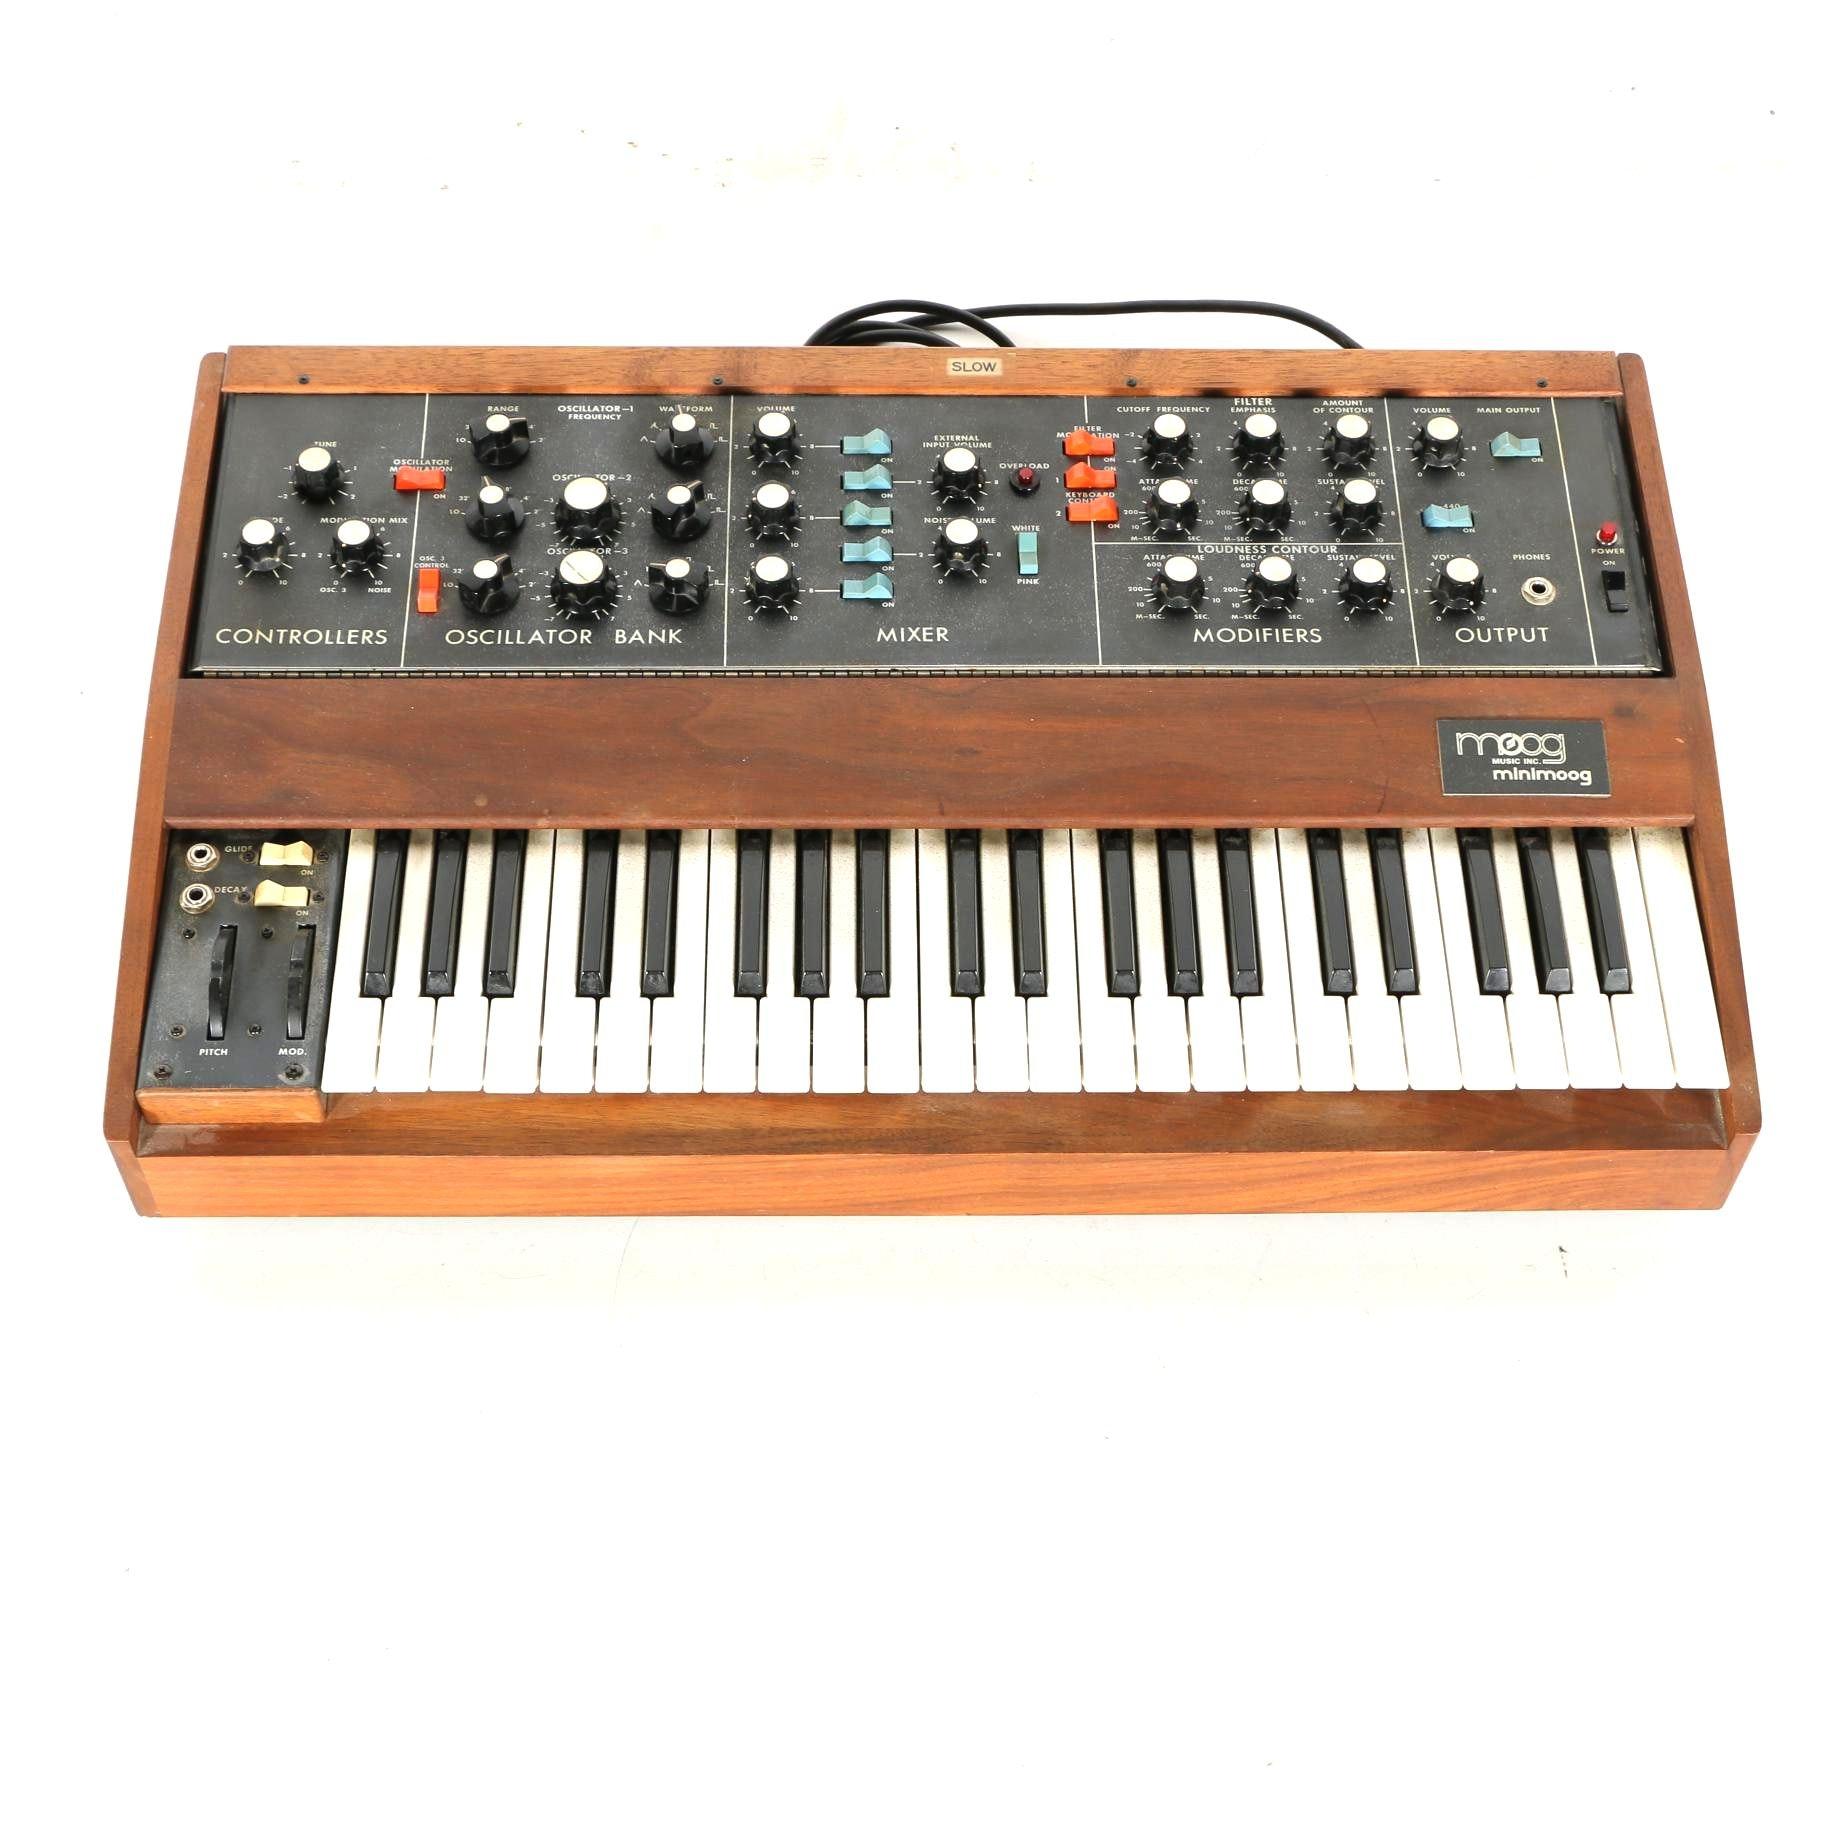 Circa 1972 Minimoog Model D Analog Synthesizer